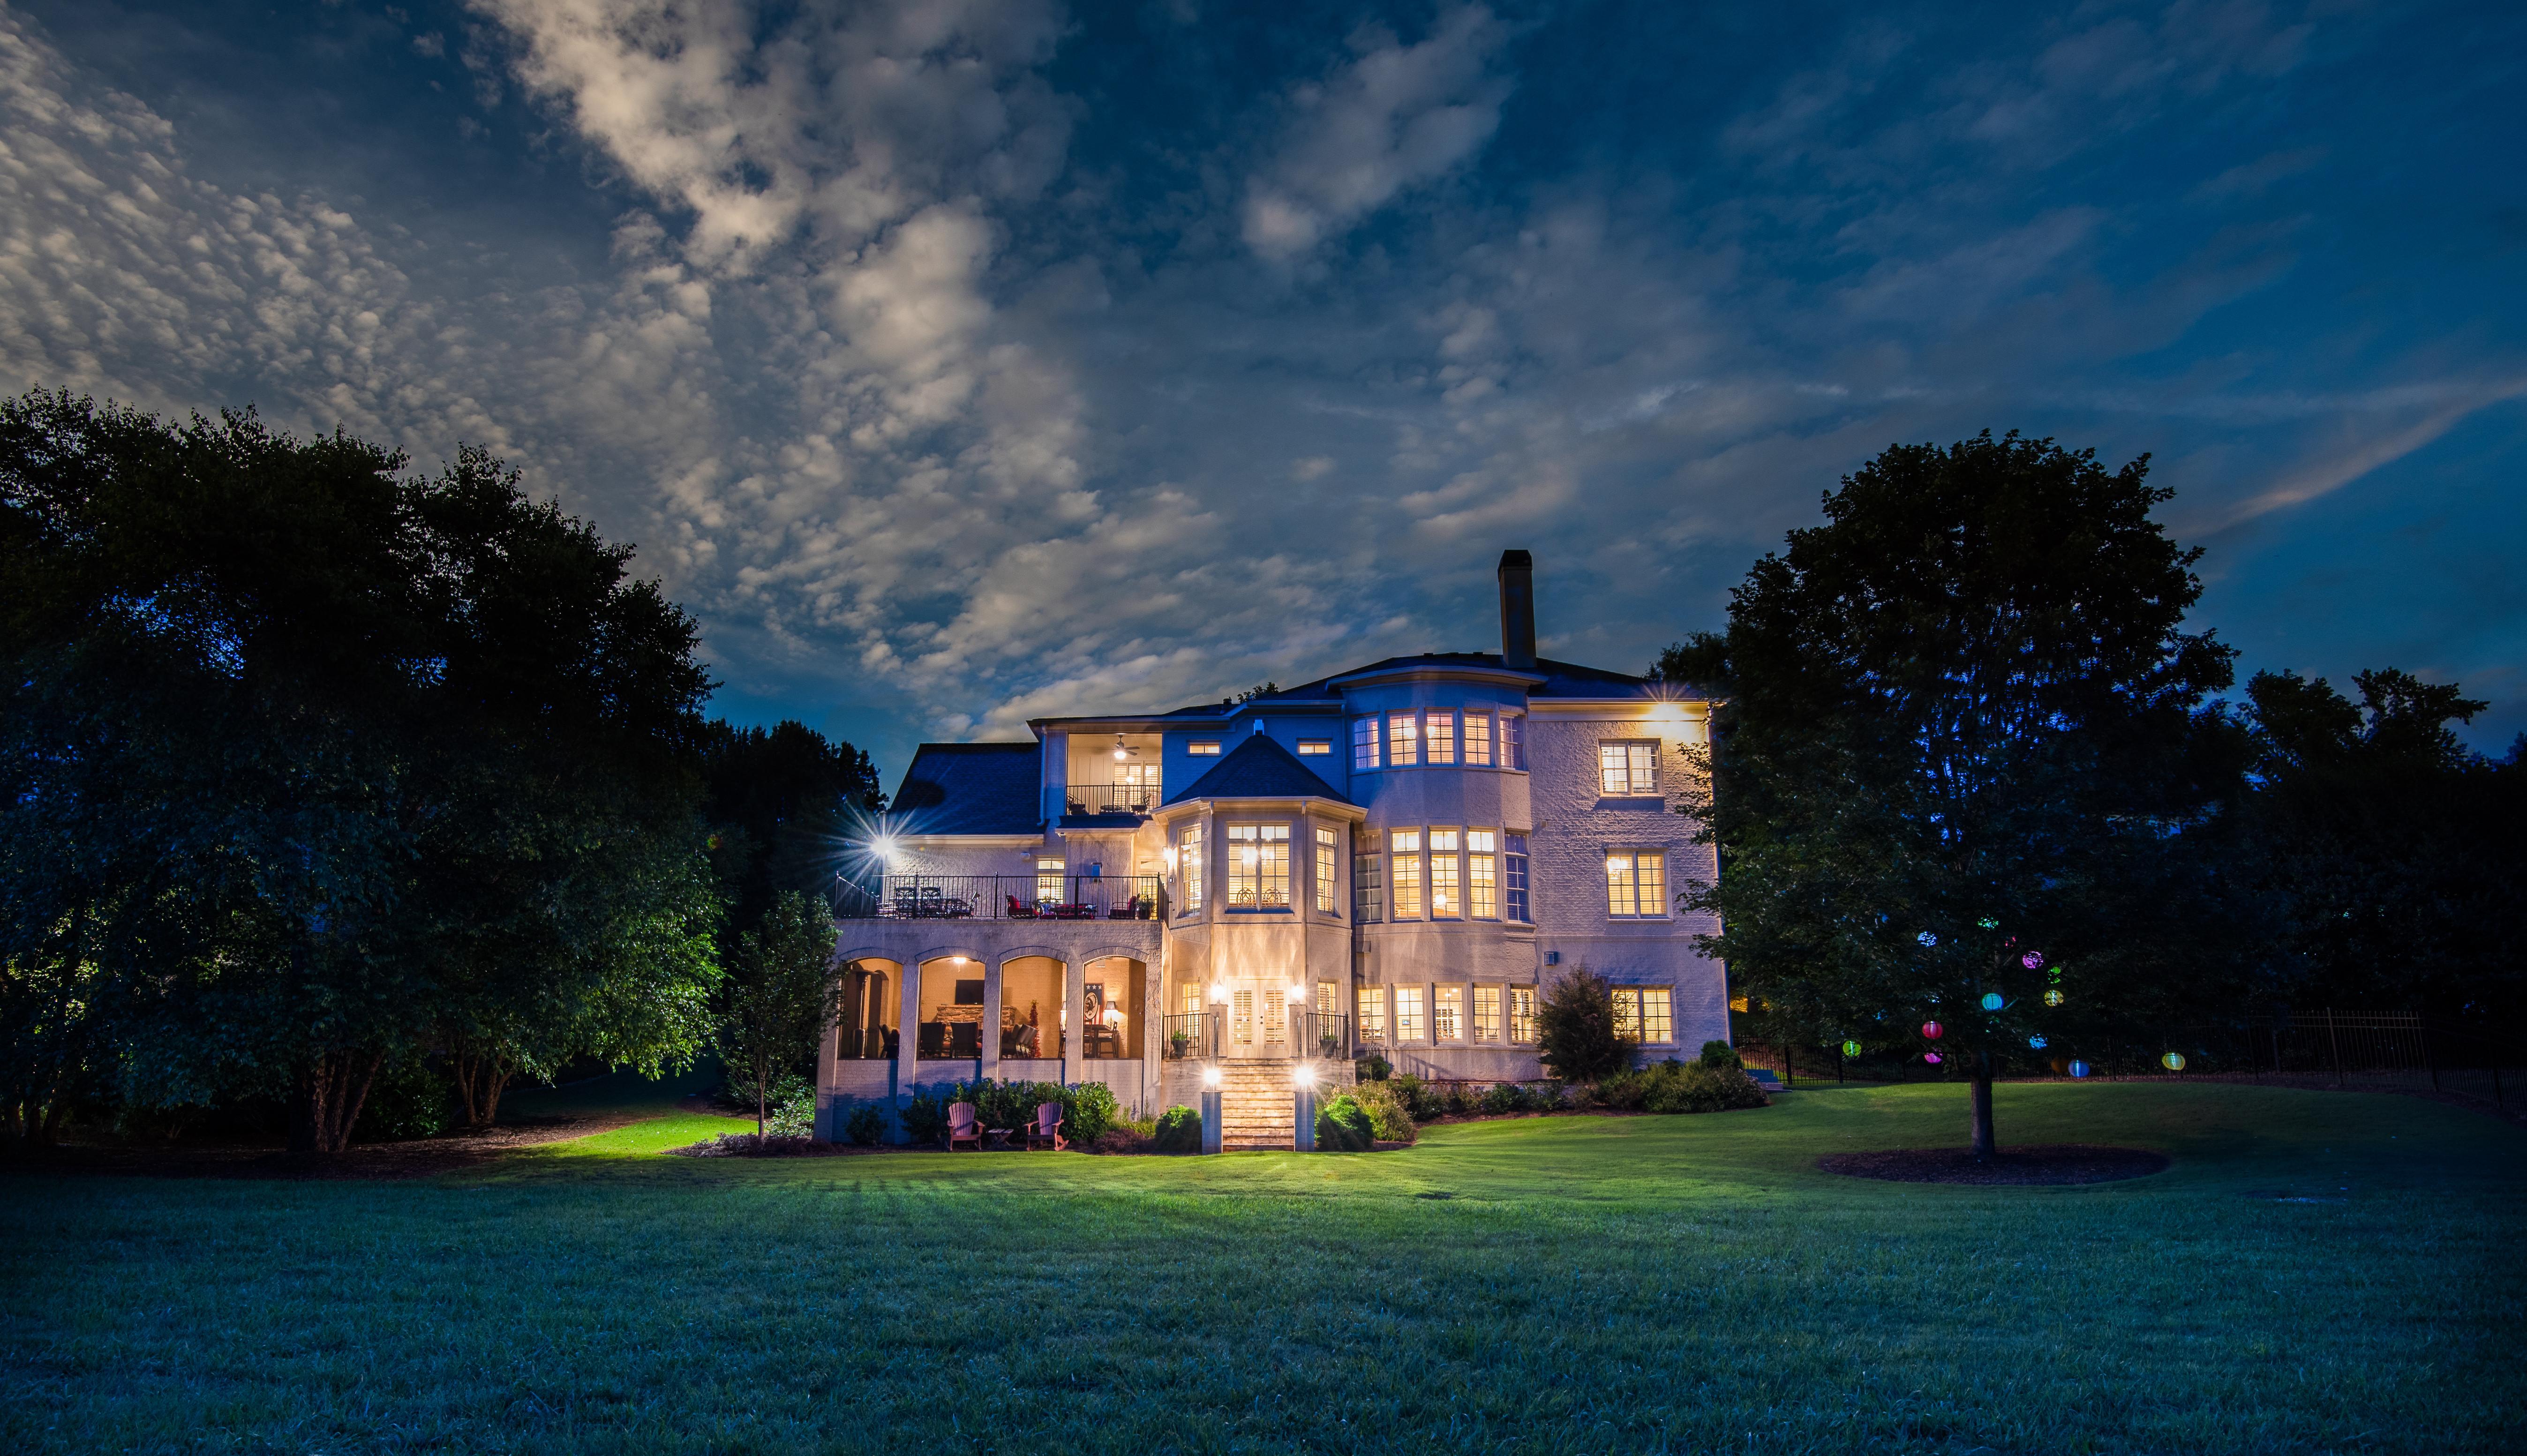 Twilight Real Estate Photos